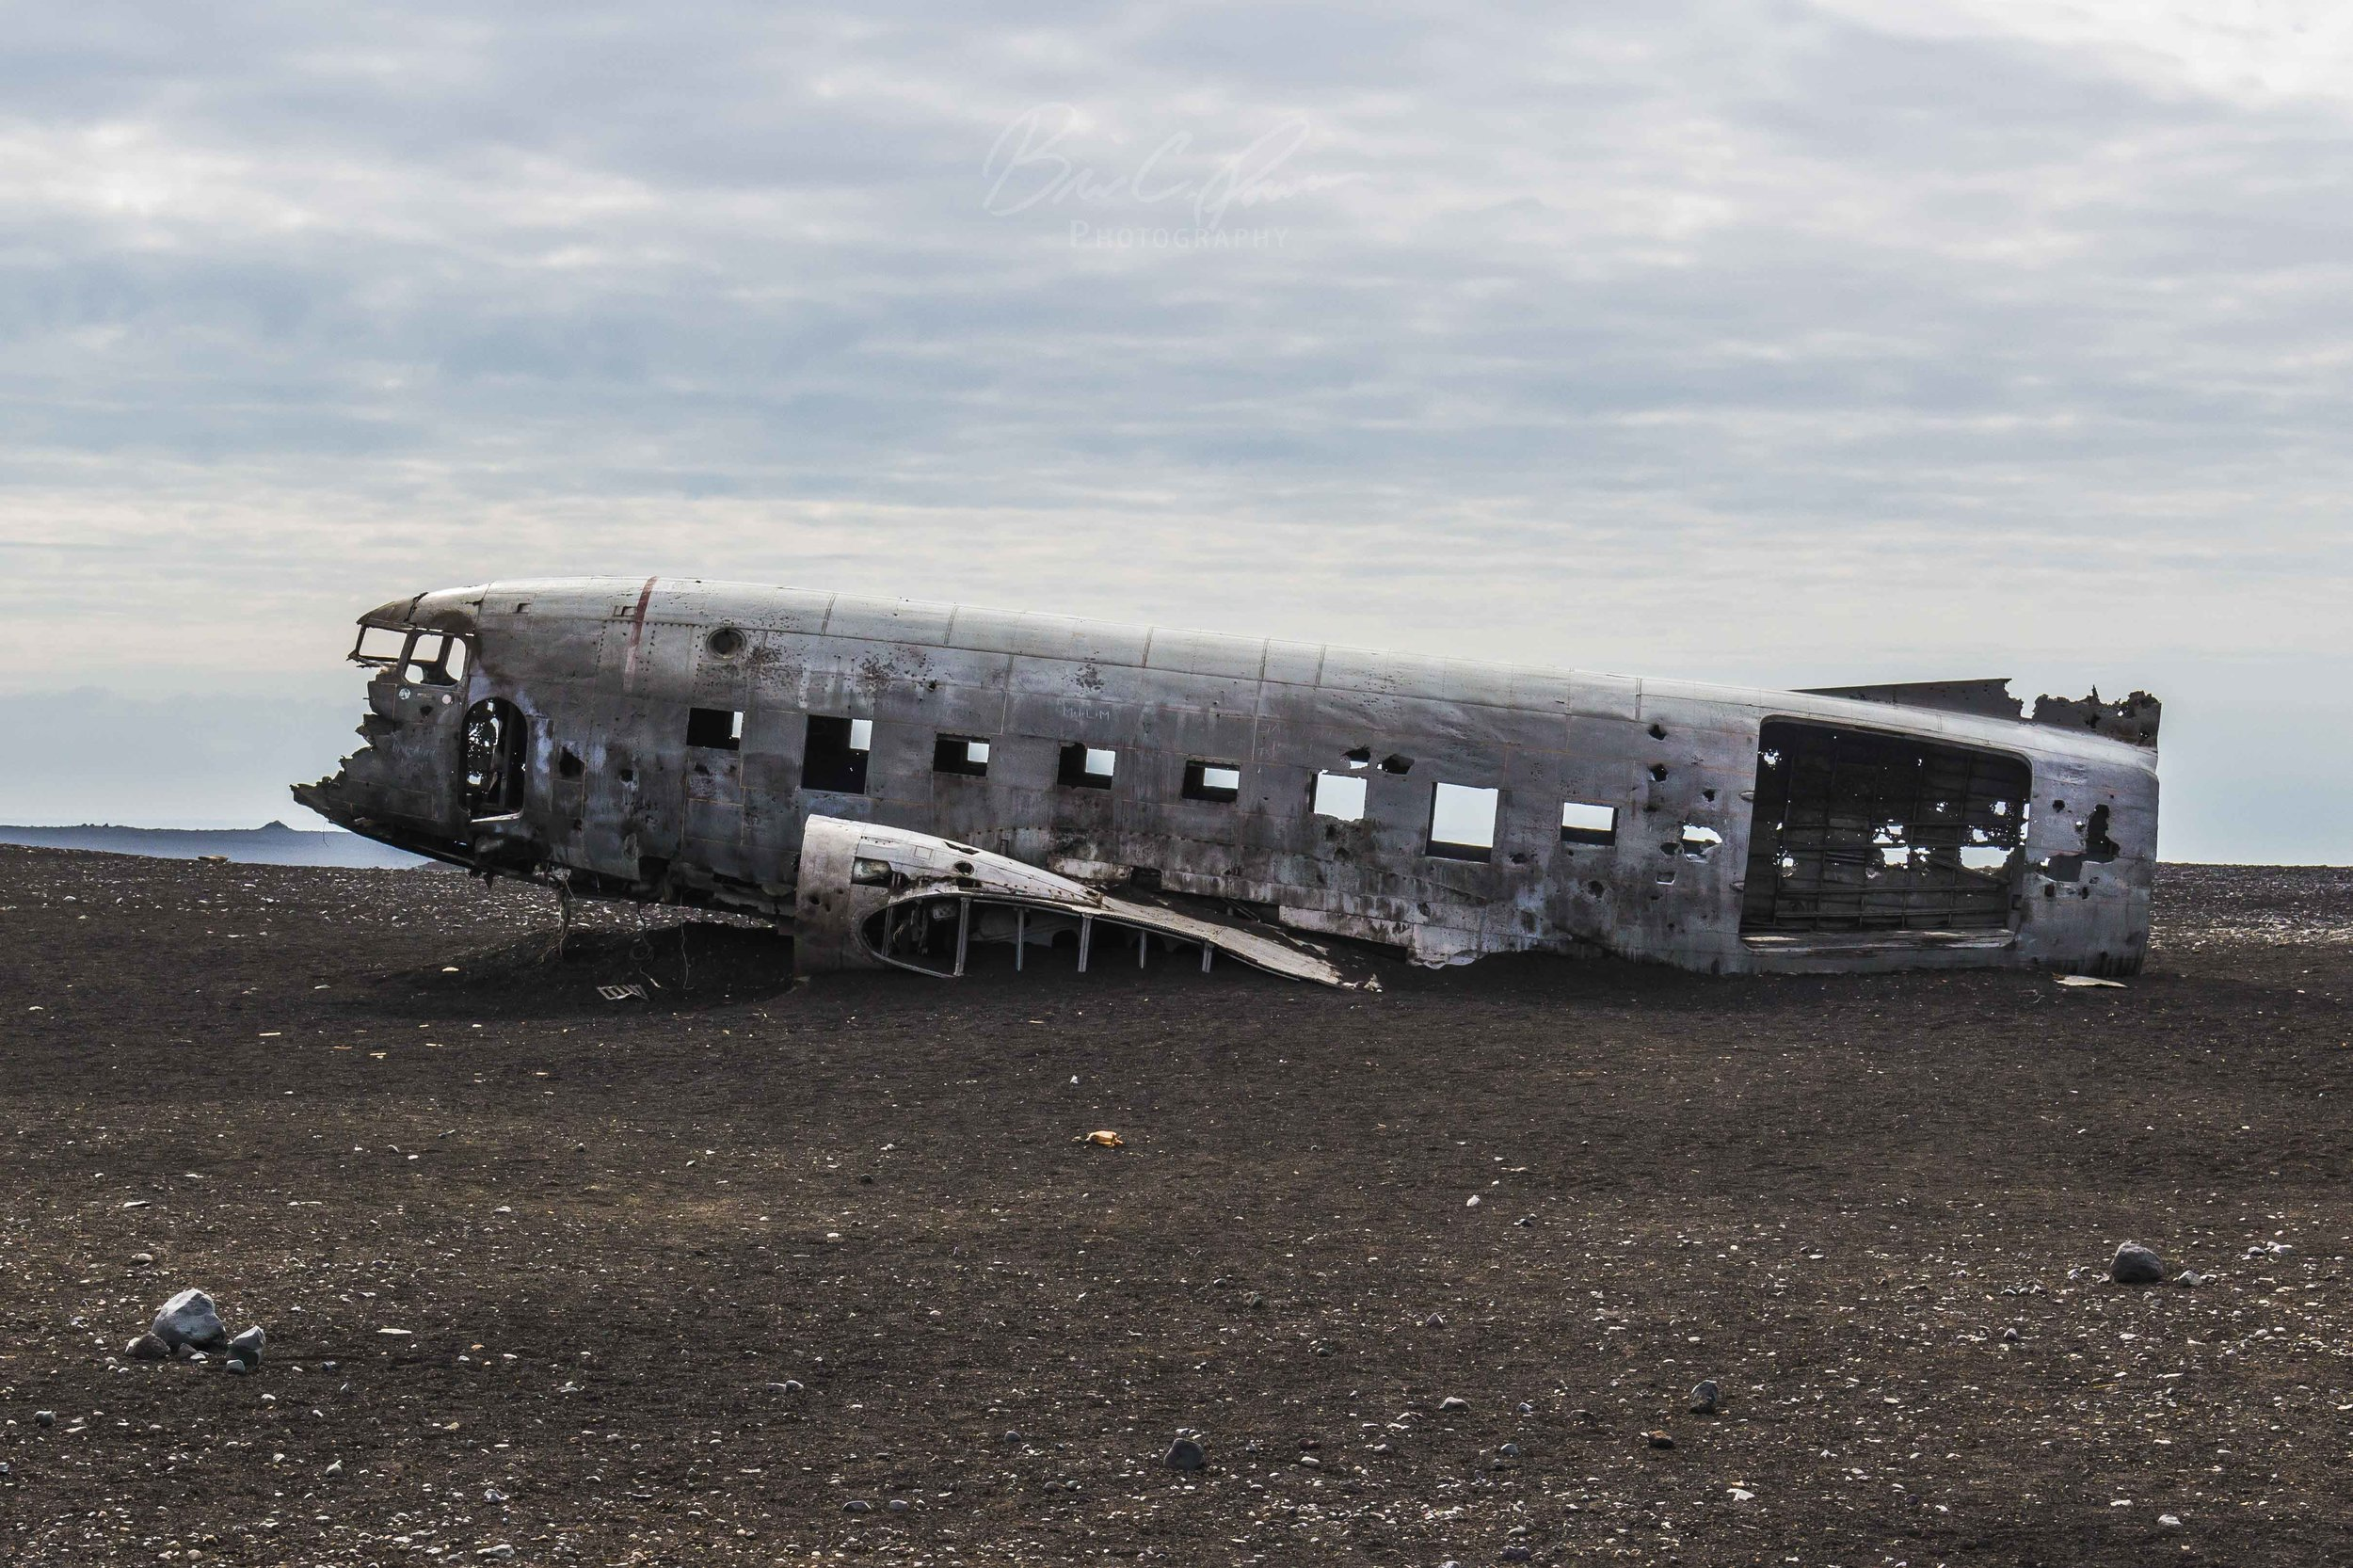 Sólheimasandur Plane Wreck Iceland.jpg